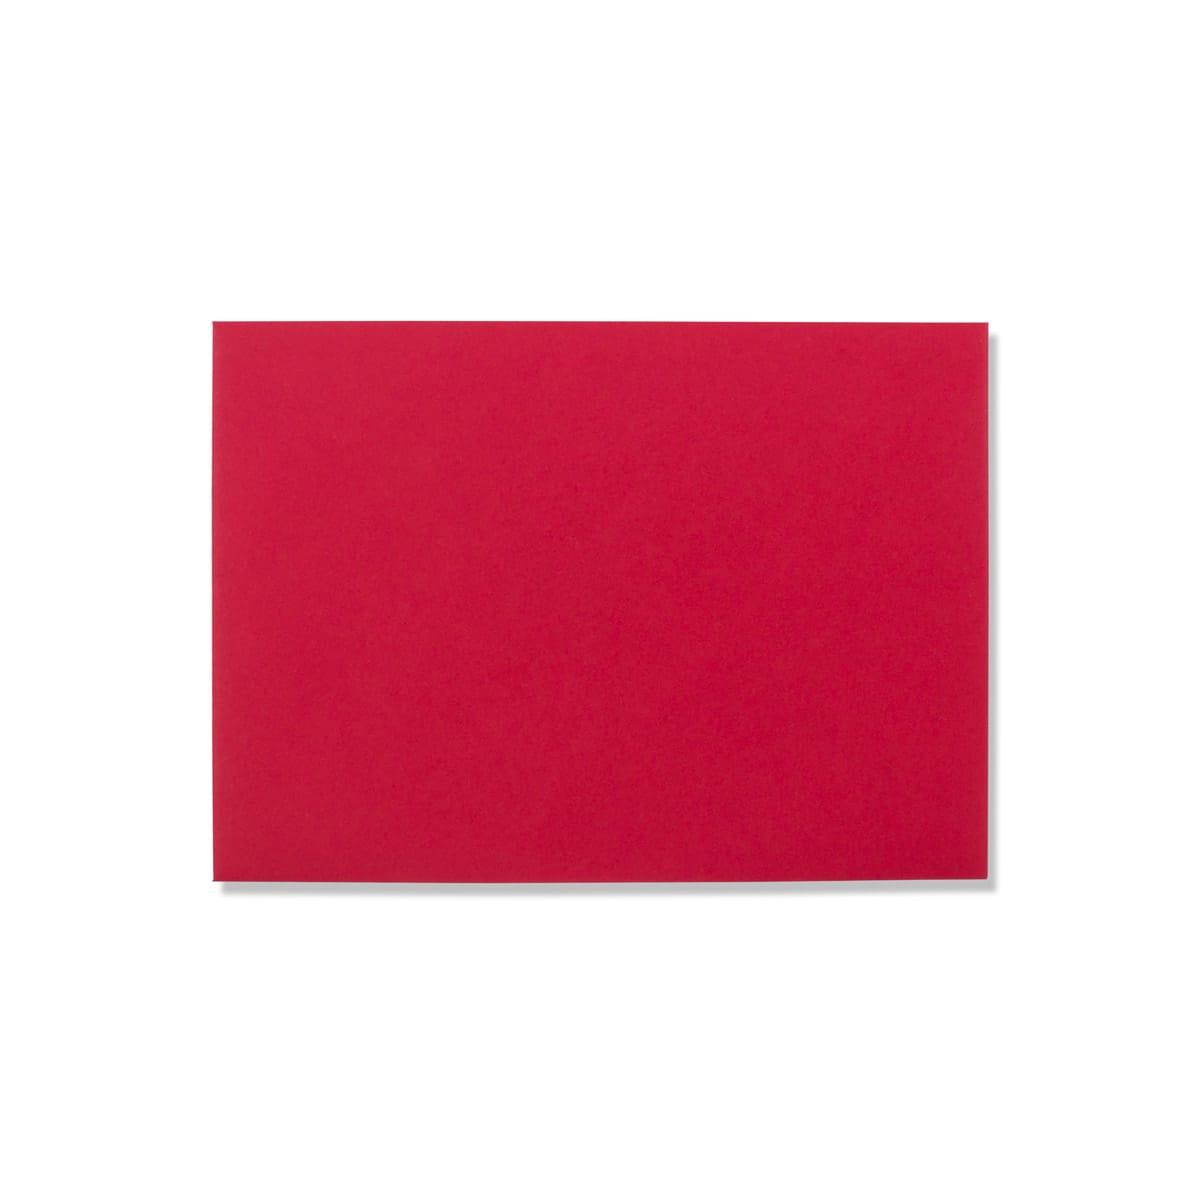 DARK RED 125 X 175mm ENVELOPES 120gsm